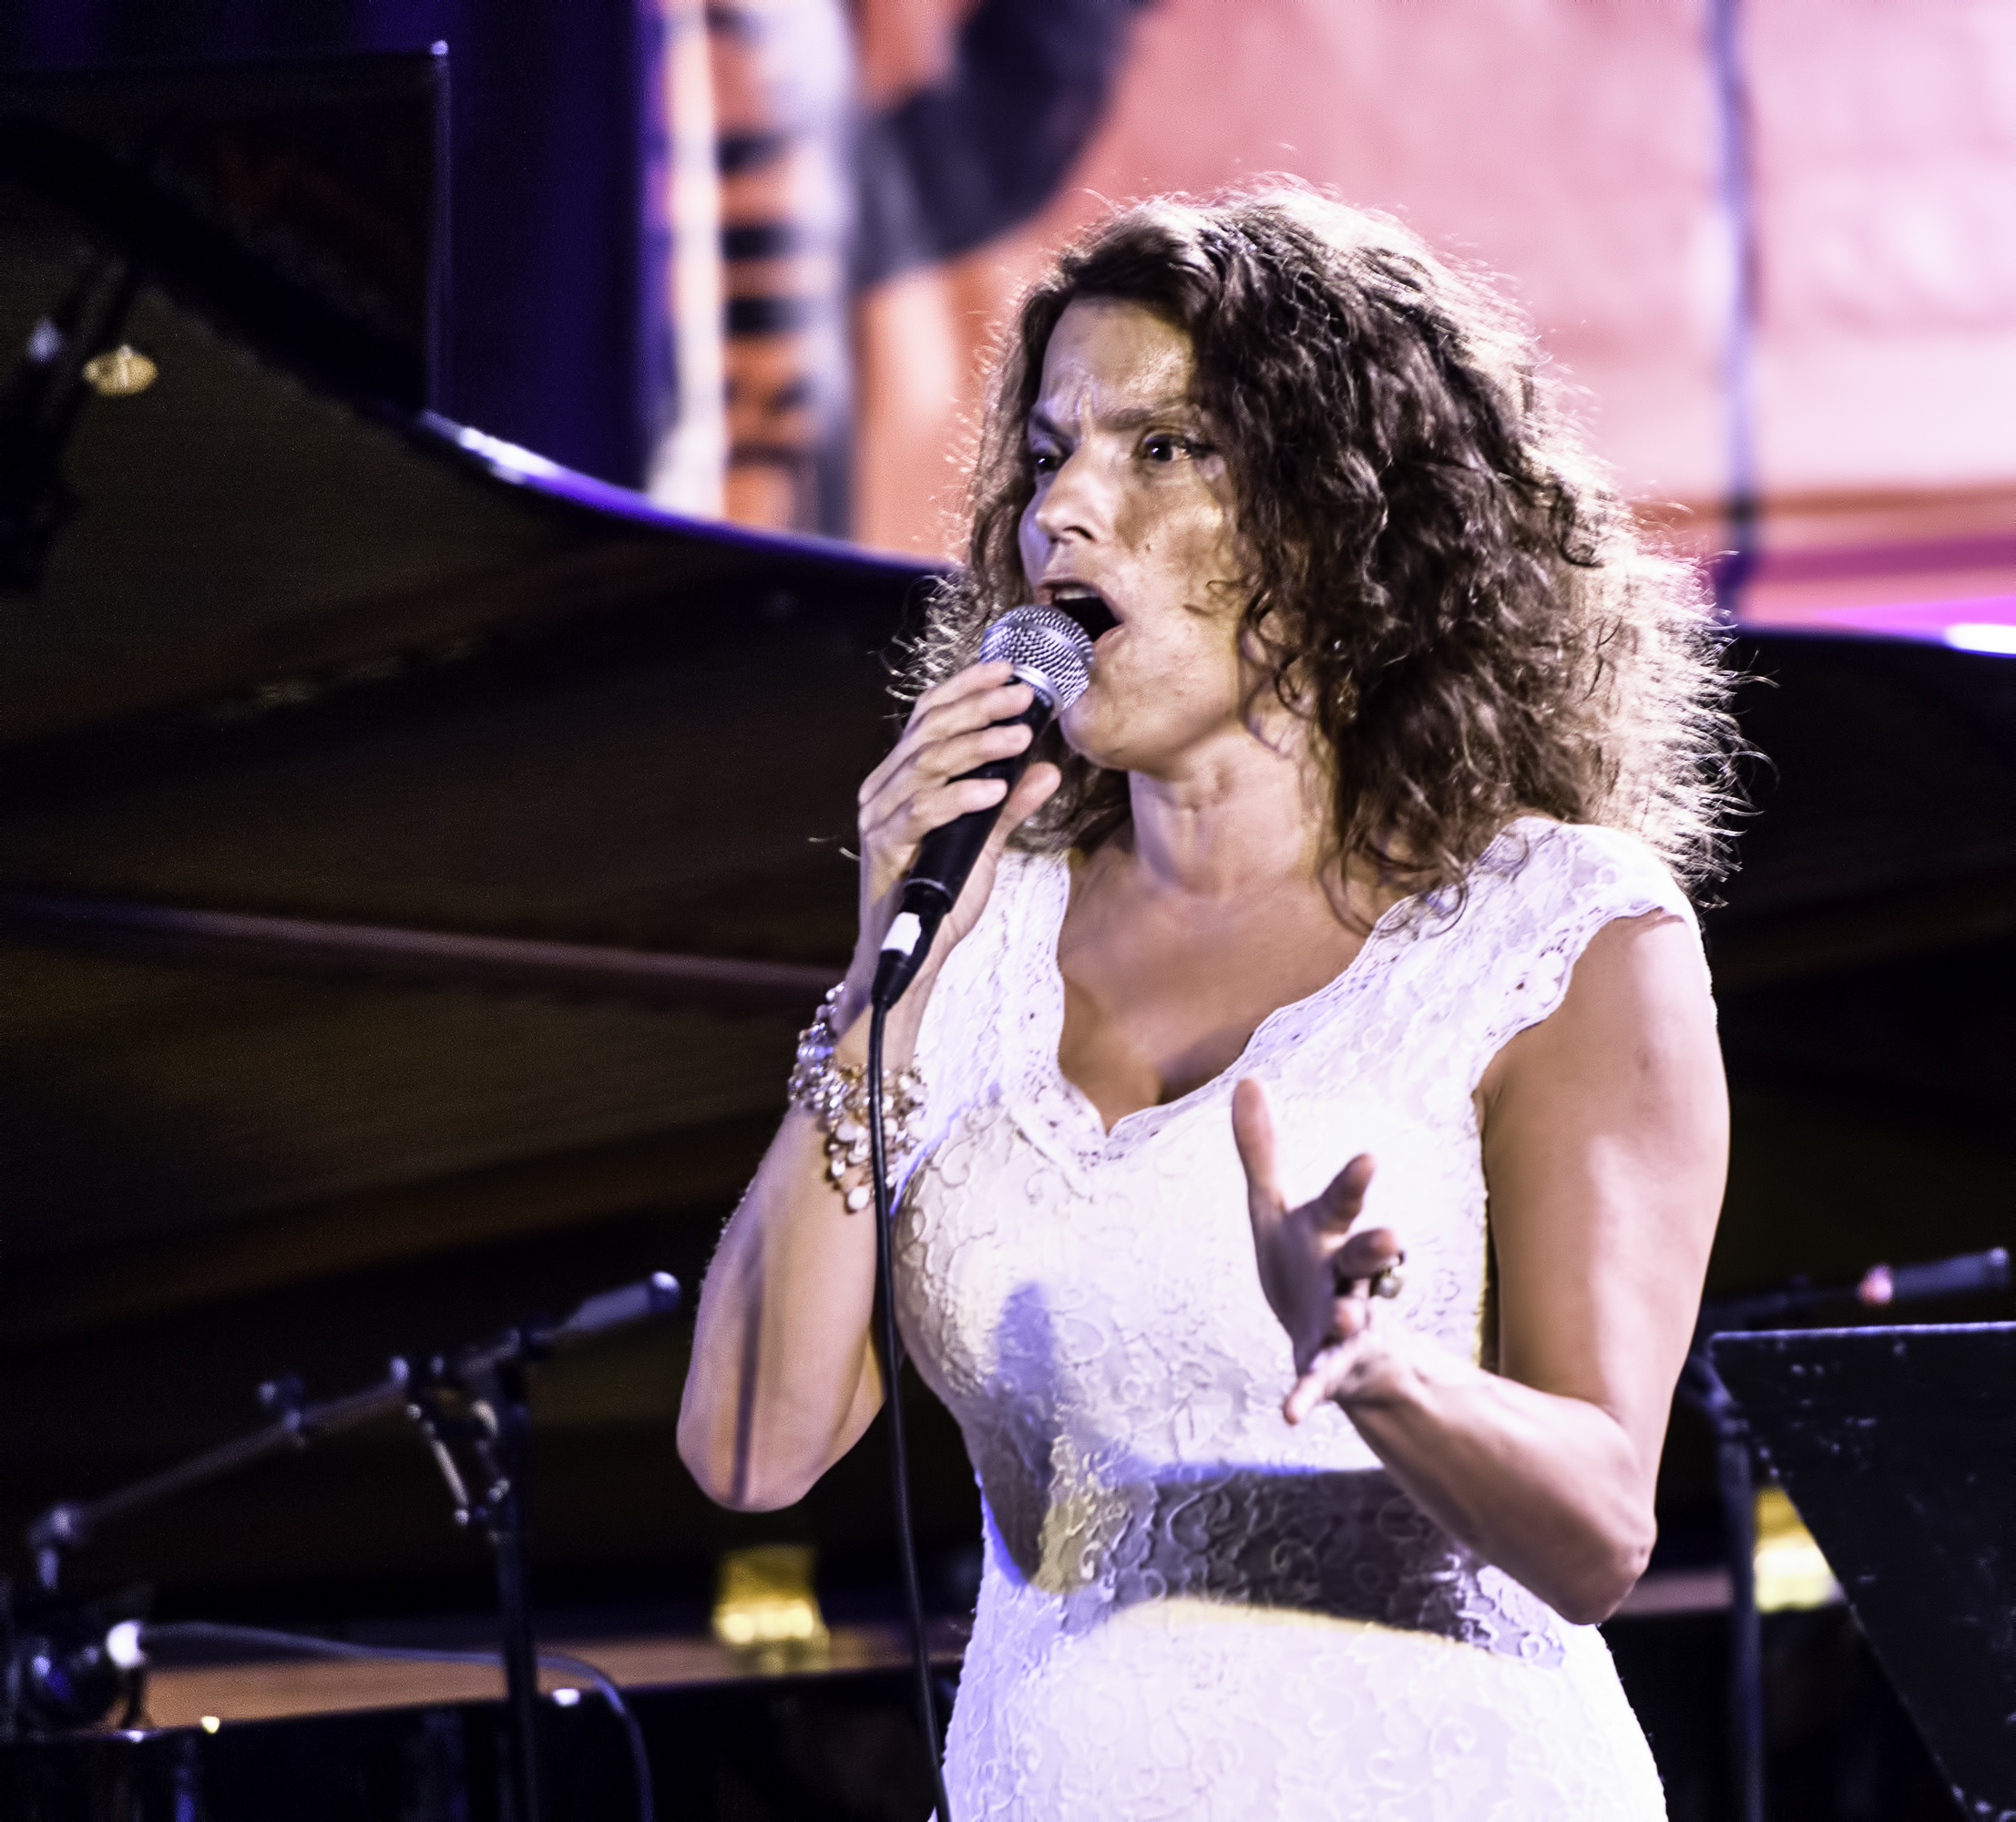 Roberta Gambarini at the Monterey Jazz Festival